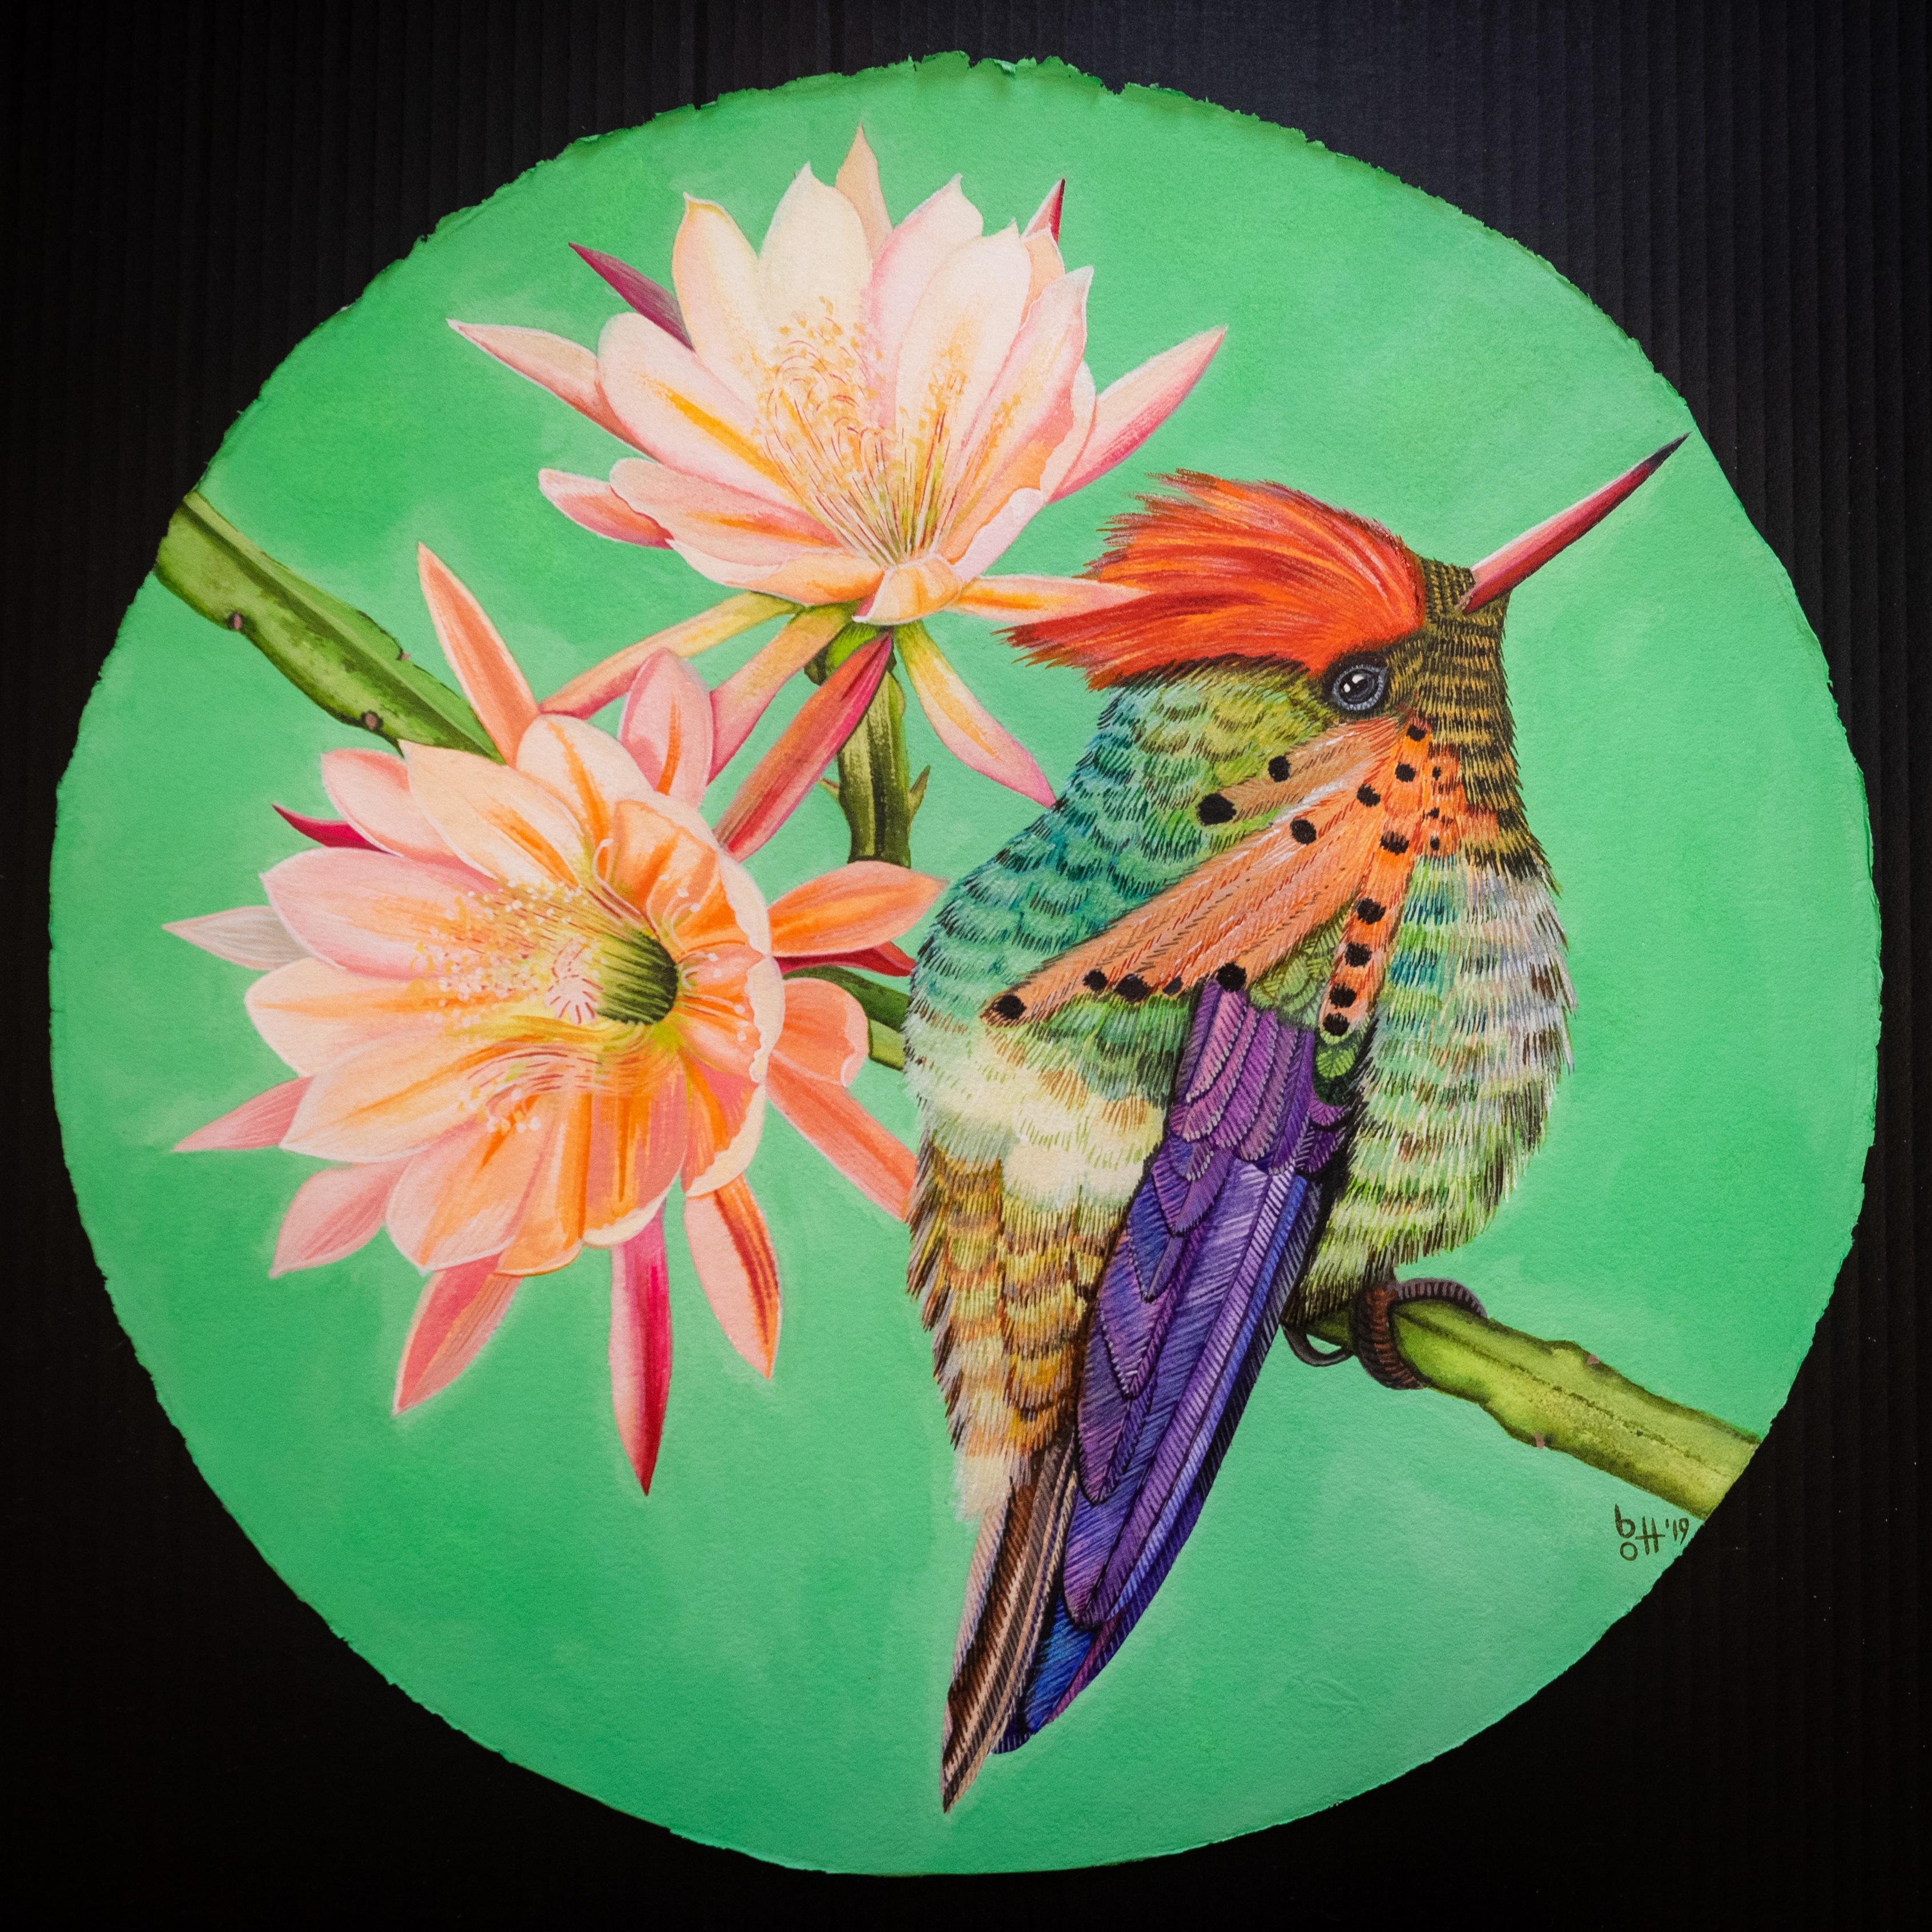 bellis et animal - Kolibri II